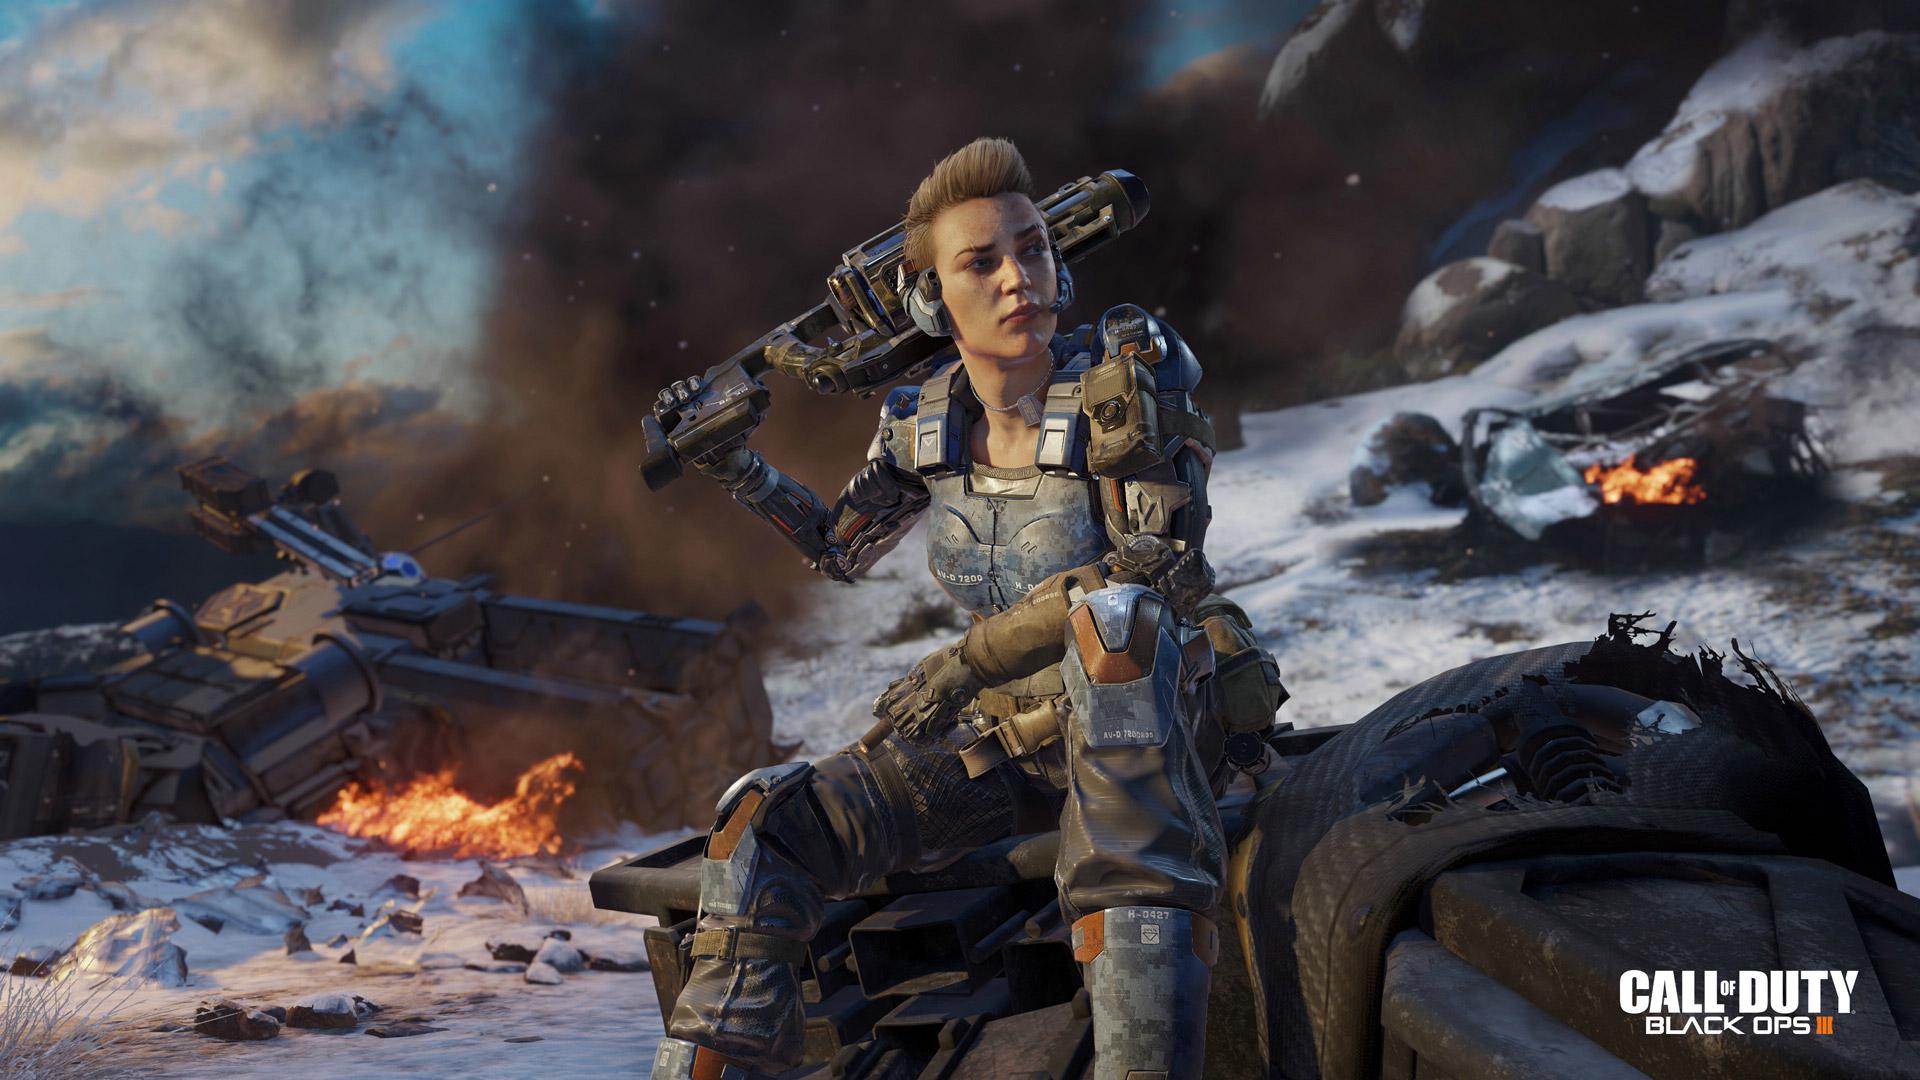 Call of Duty Black Ops 3 wallpaper 17 1920x1080